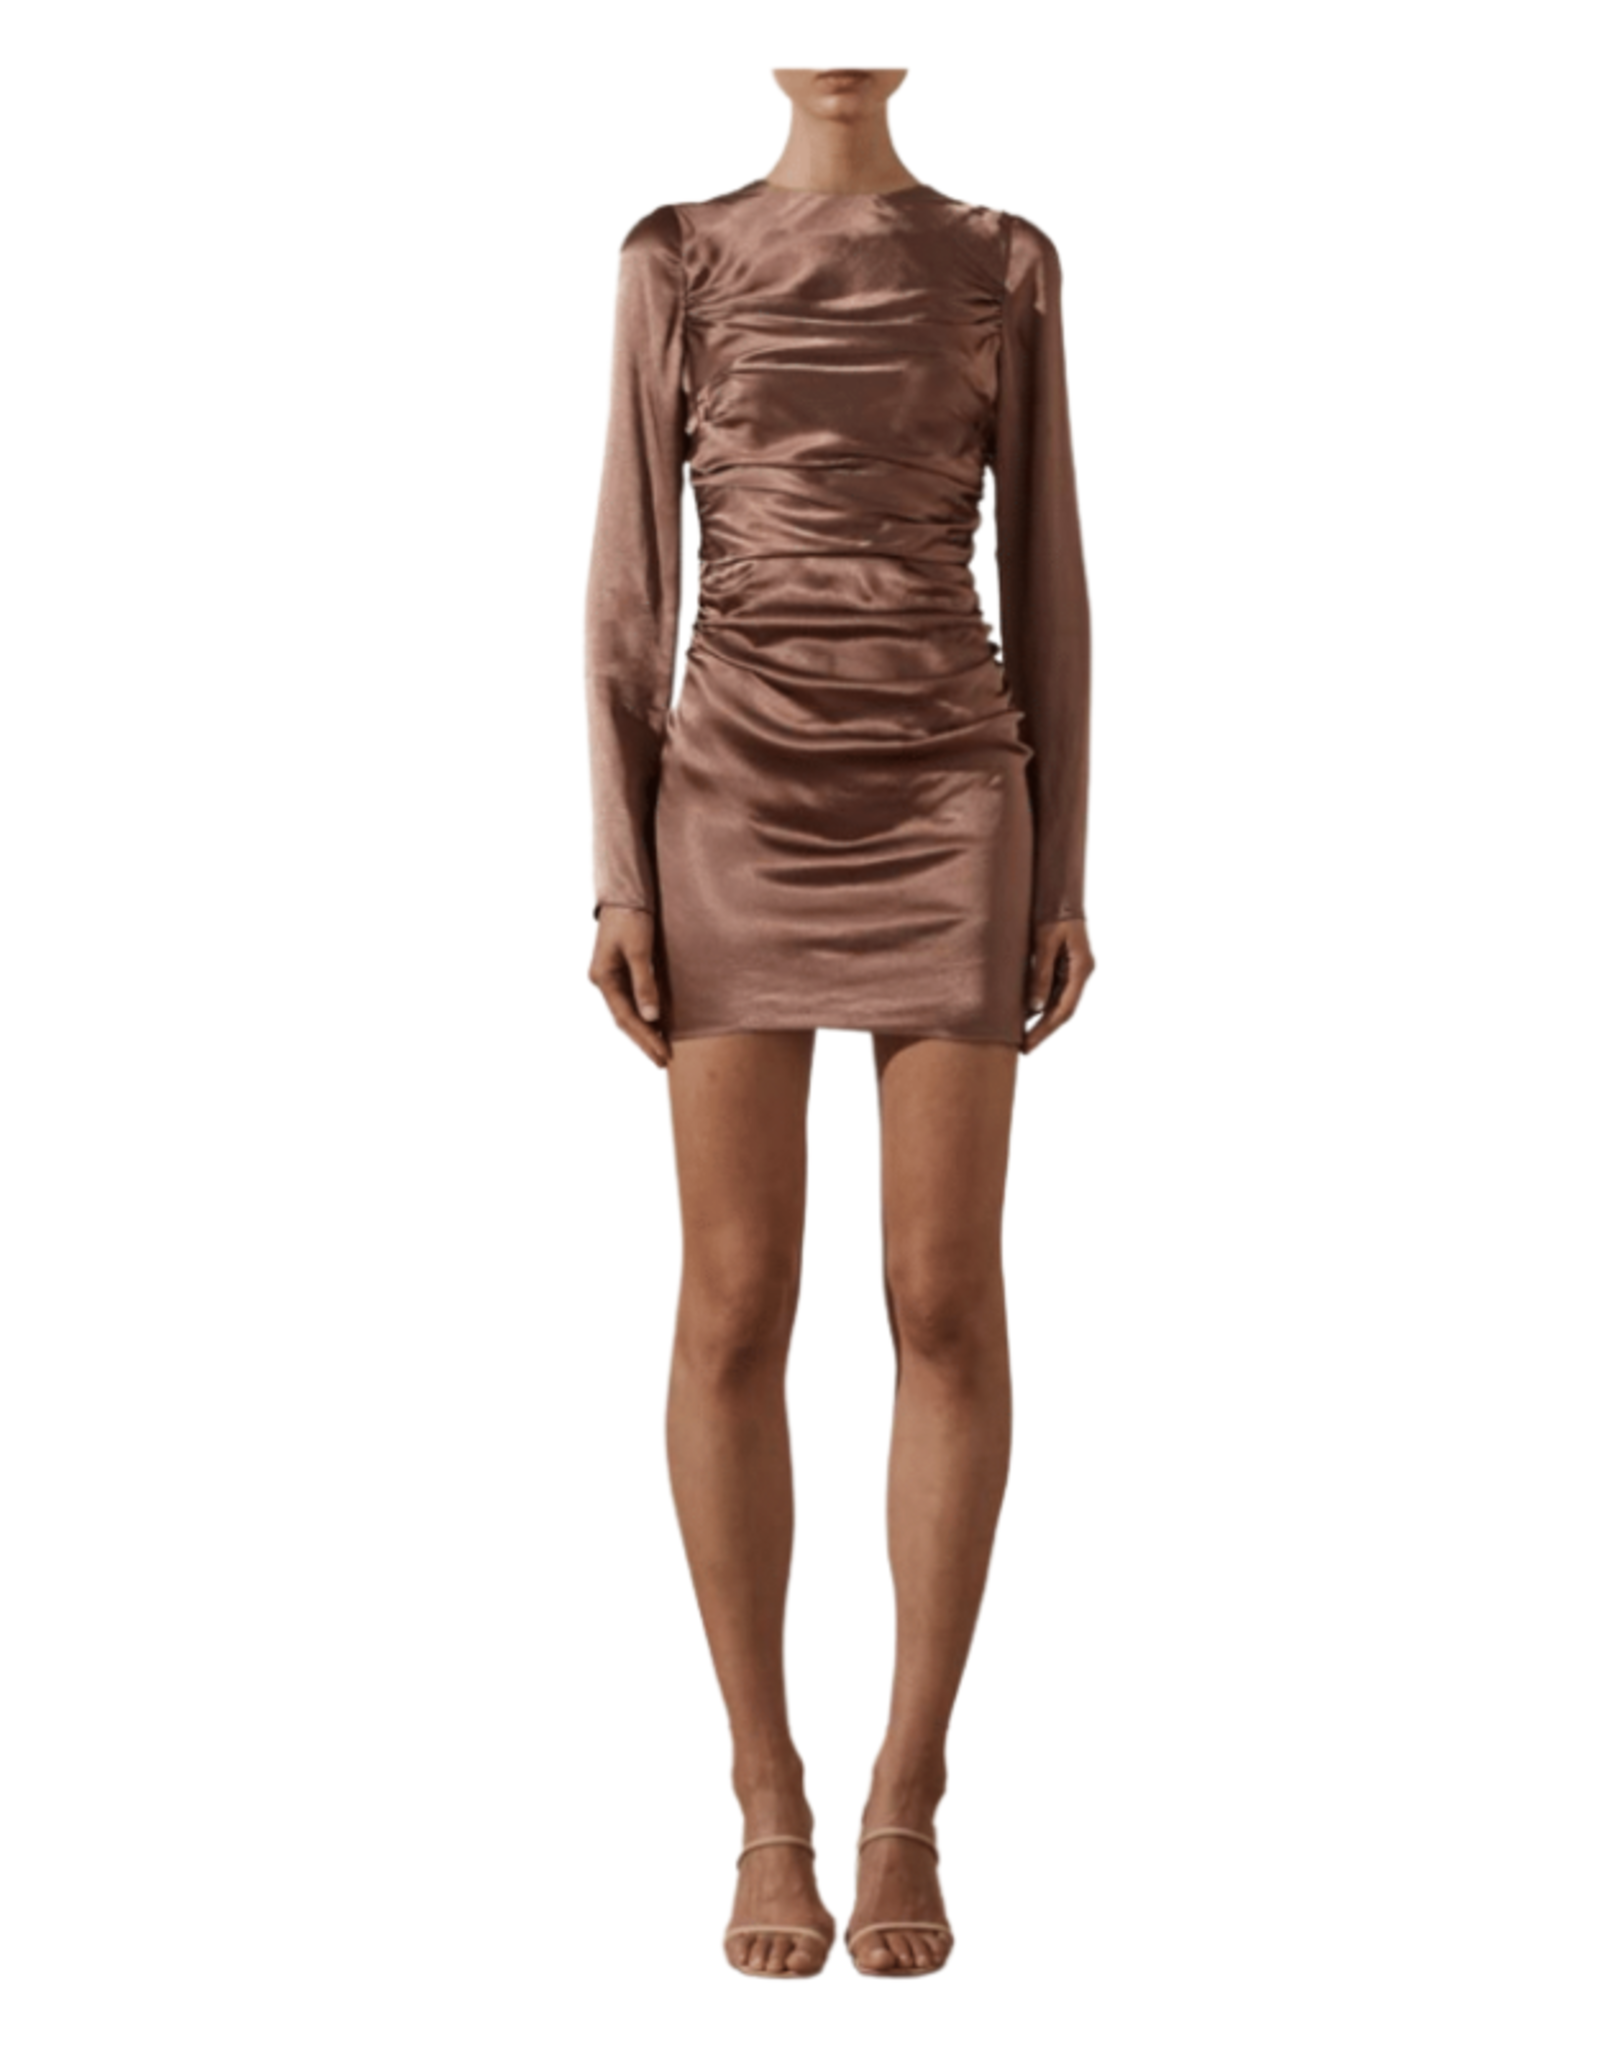 SHONA JOY Lily Long Sleeve Ruched Mini Dress